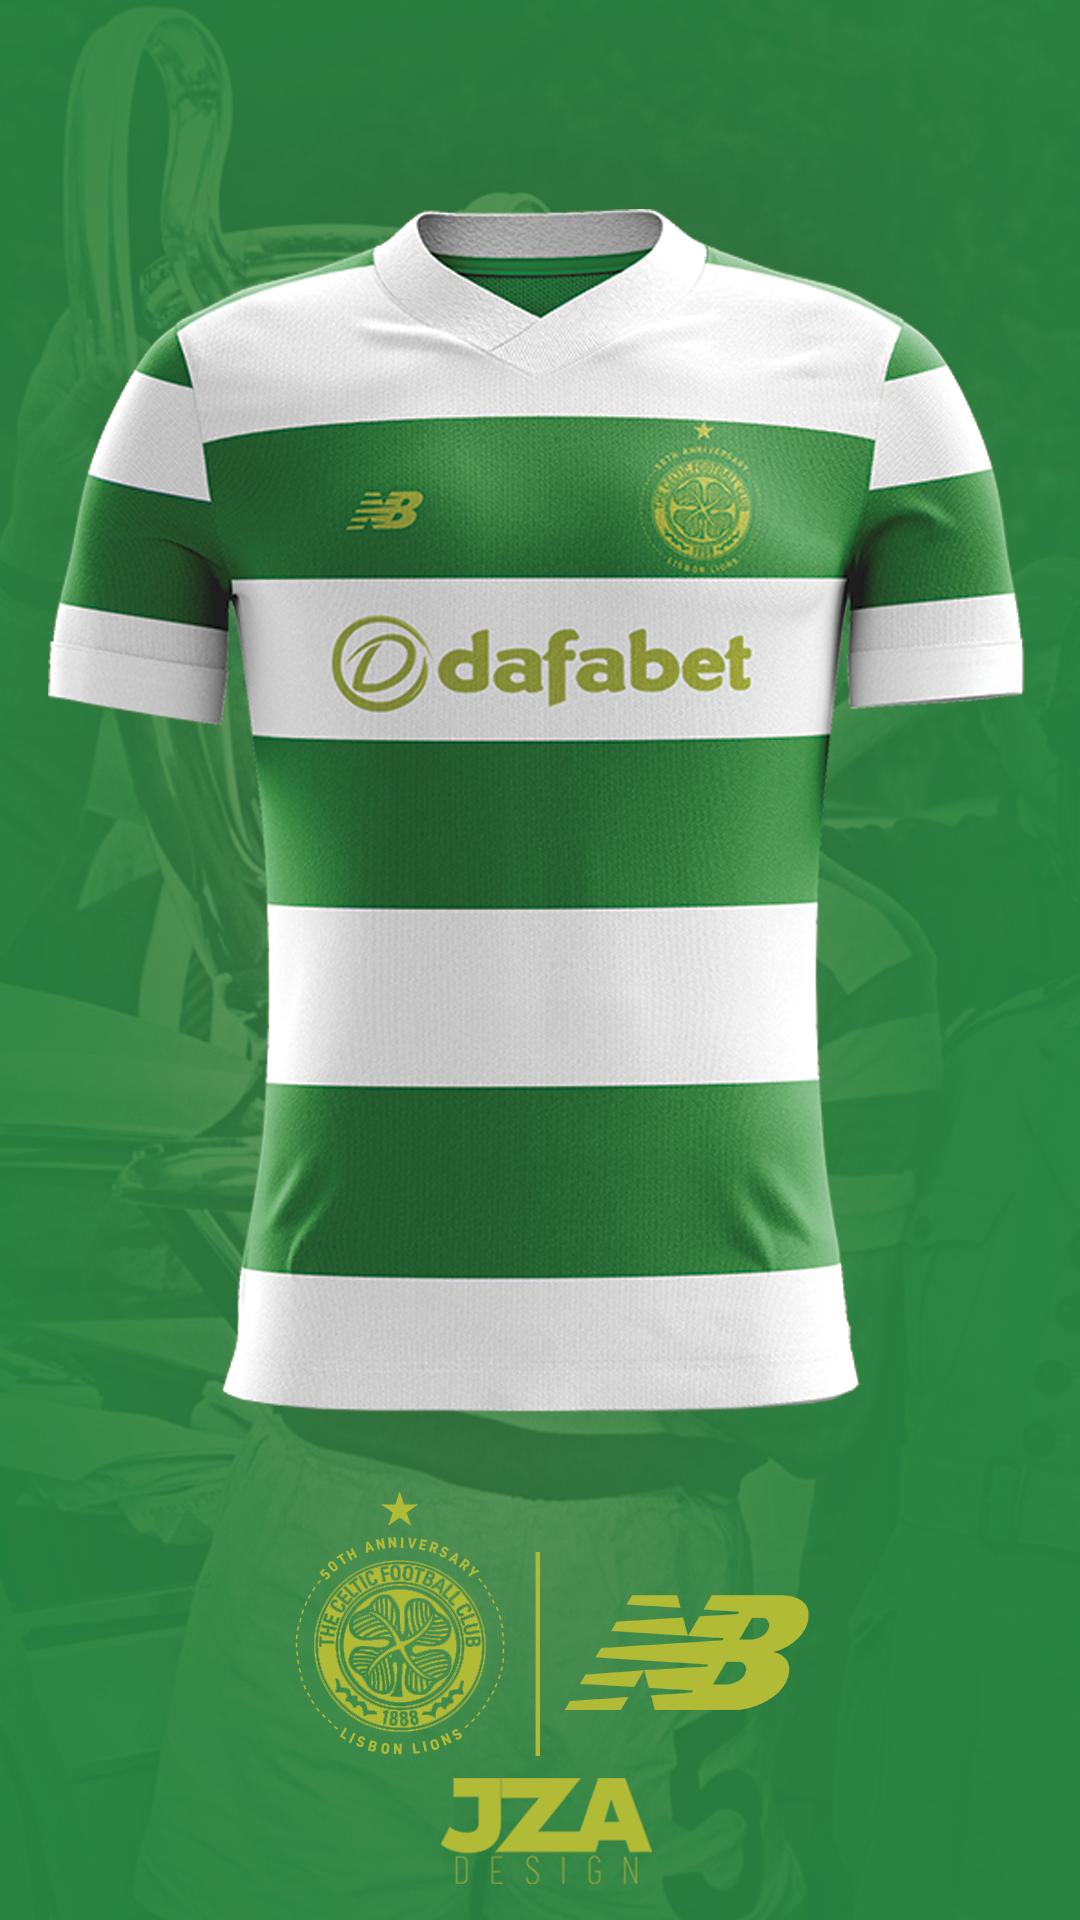 385215677 Celtic 17 18 Home Shirt Concept - Lisbon 50th on Behance